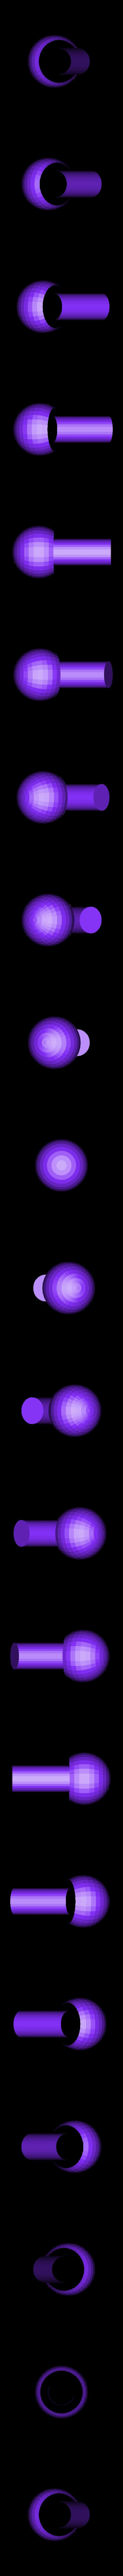 christmas_flower_center_ball.stl Download free STL file Christmas Flower with Seperated Center Ball • 3D printing model, Endless3D